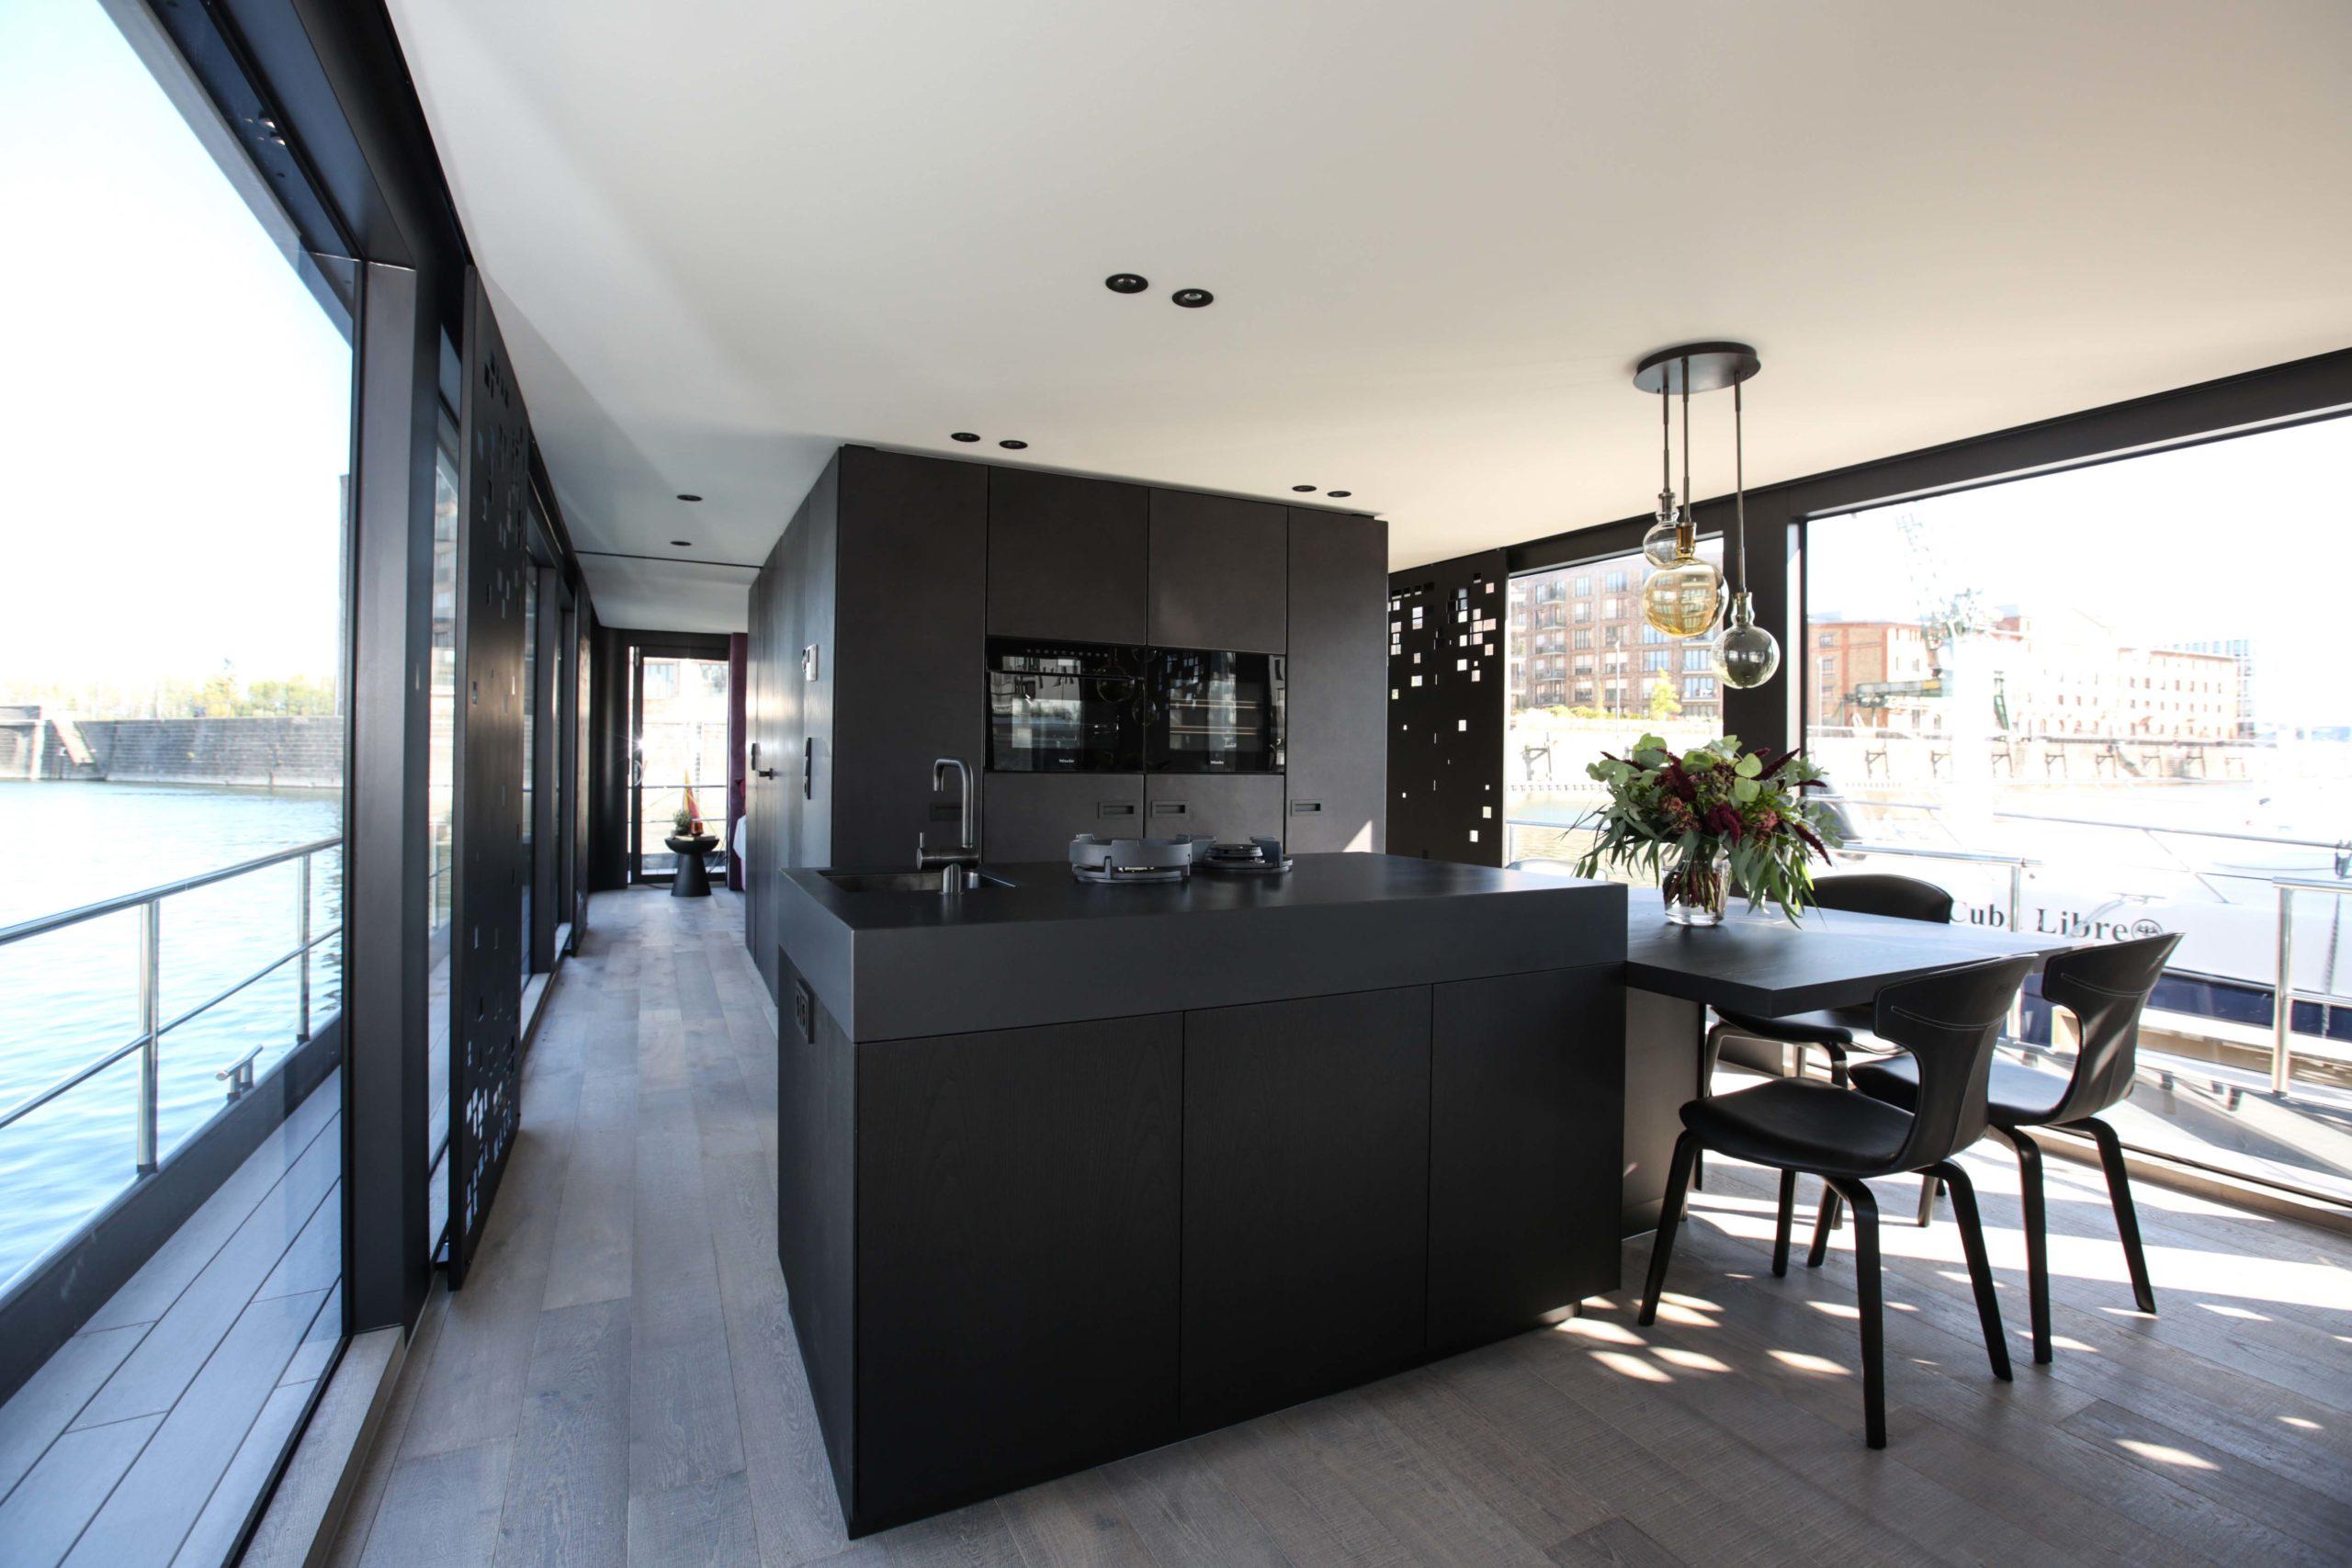 Moderne Küche Küchendesign Onyx Hausboot Nobla Raumgestaltung